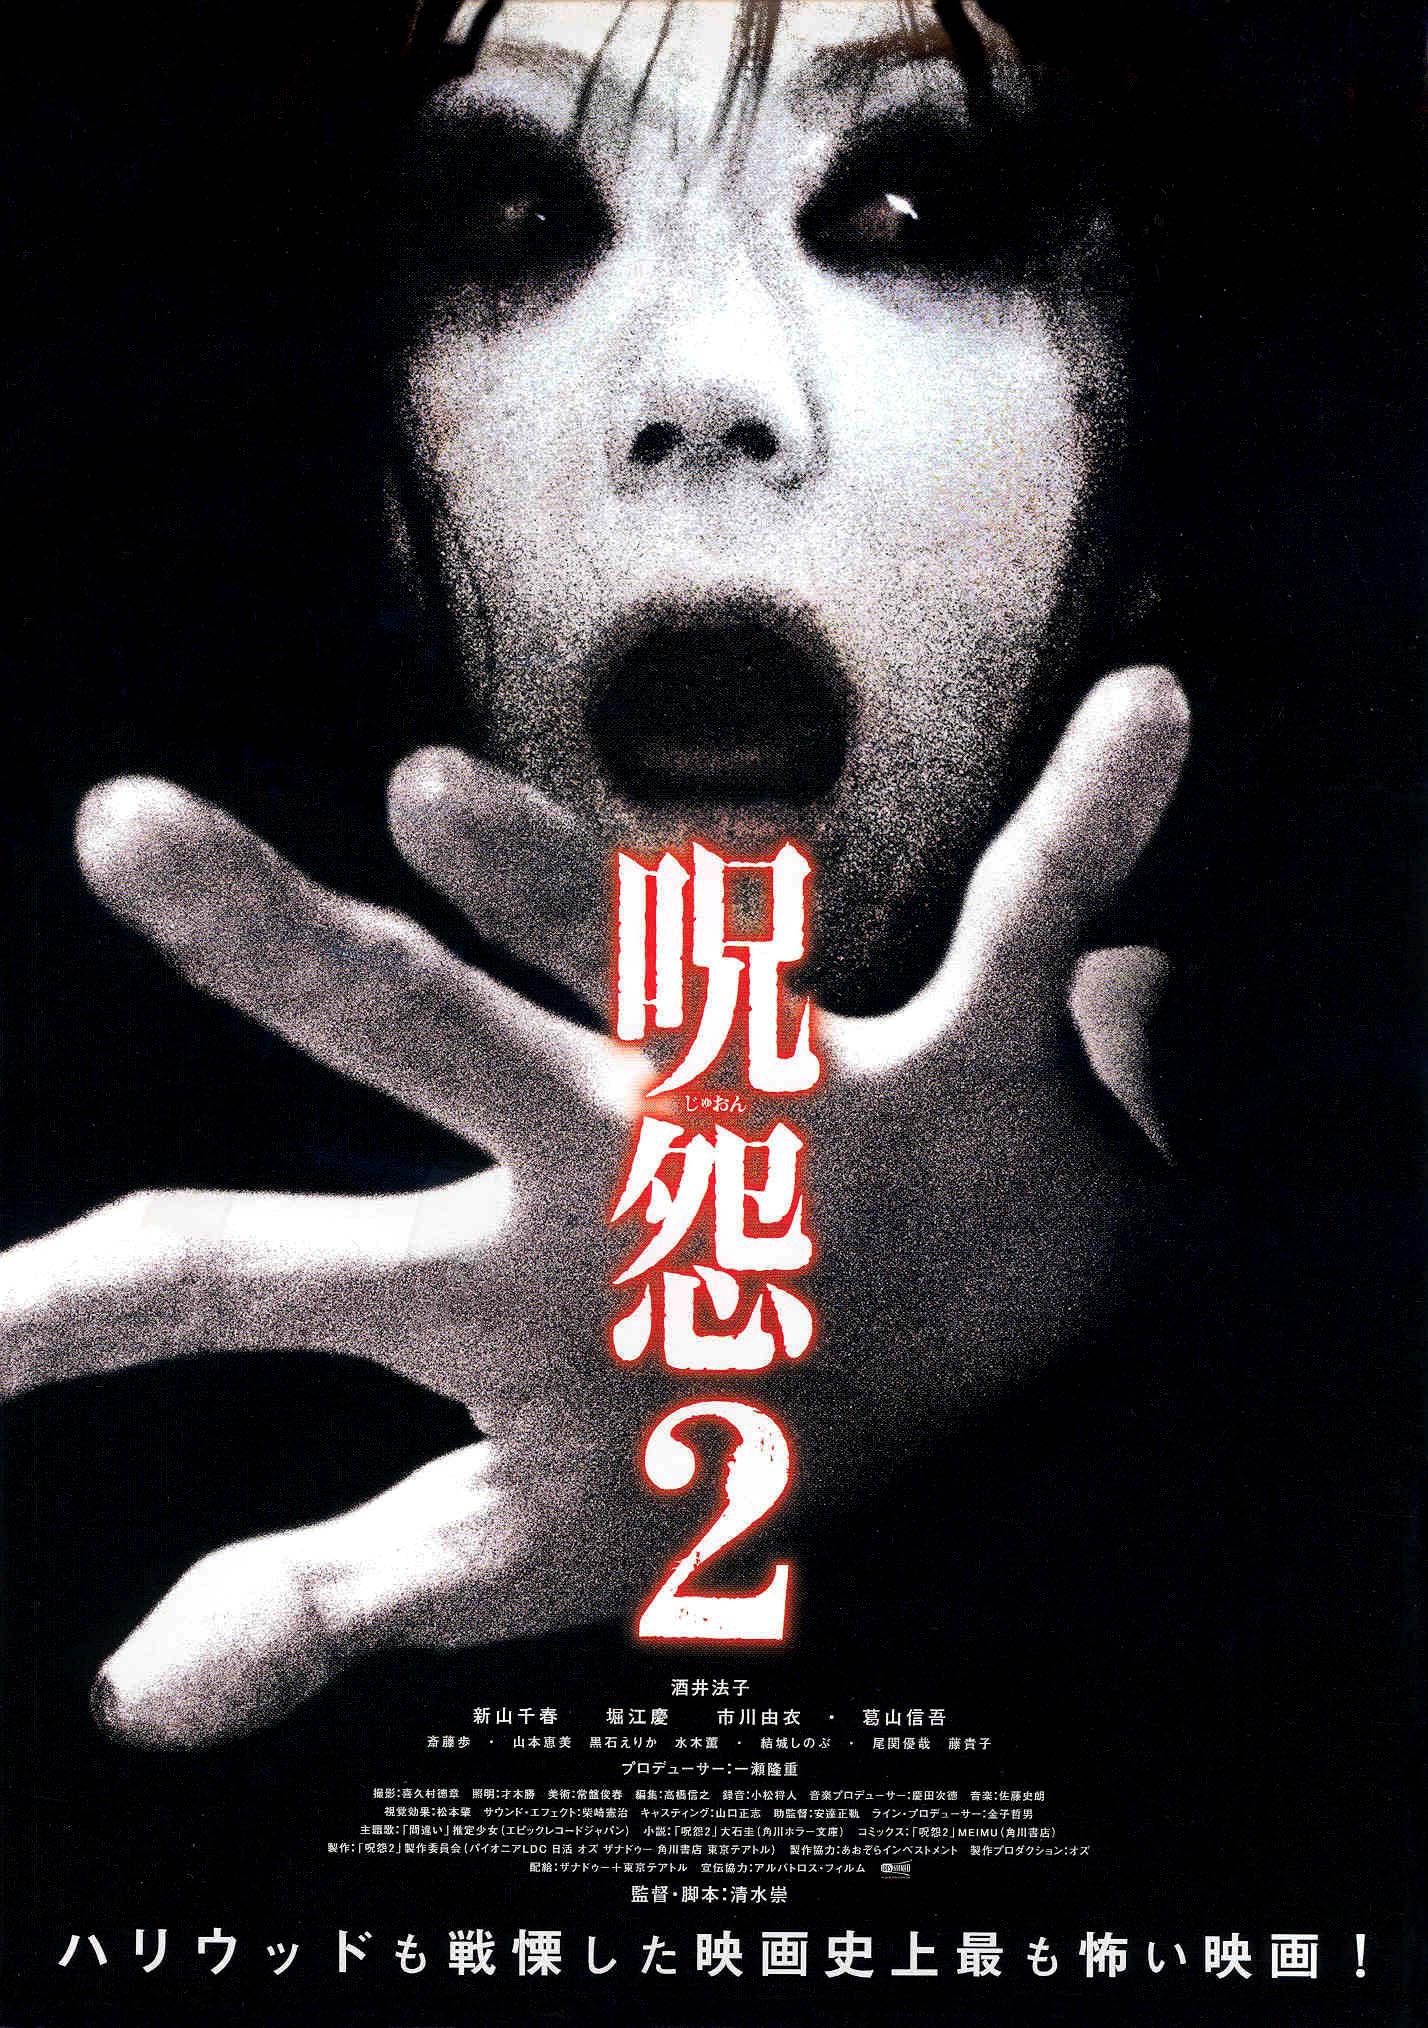 Проклятие 2 (2003)